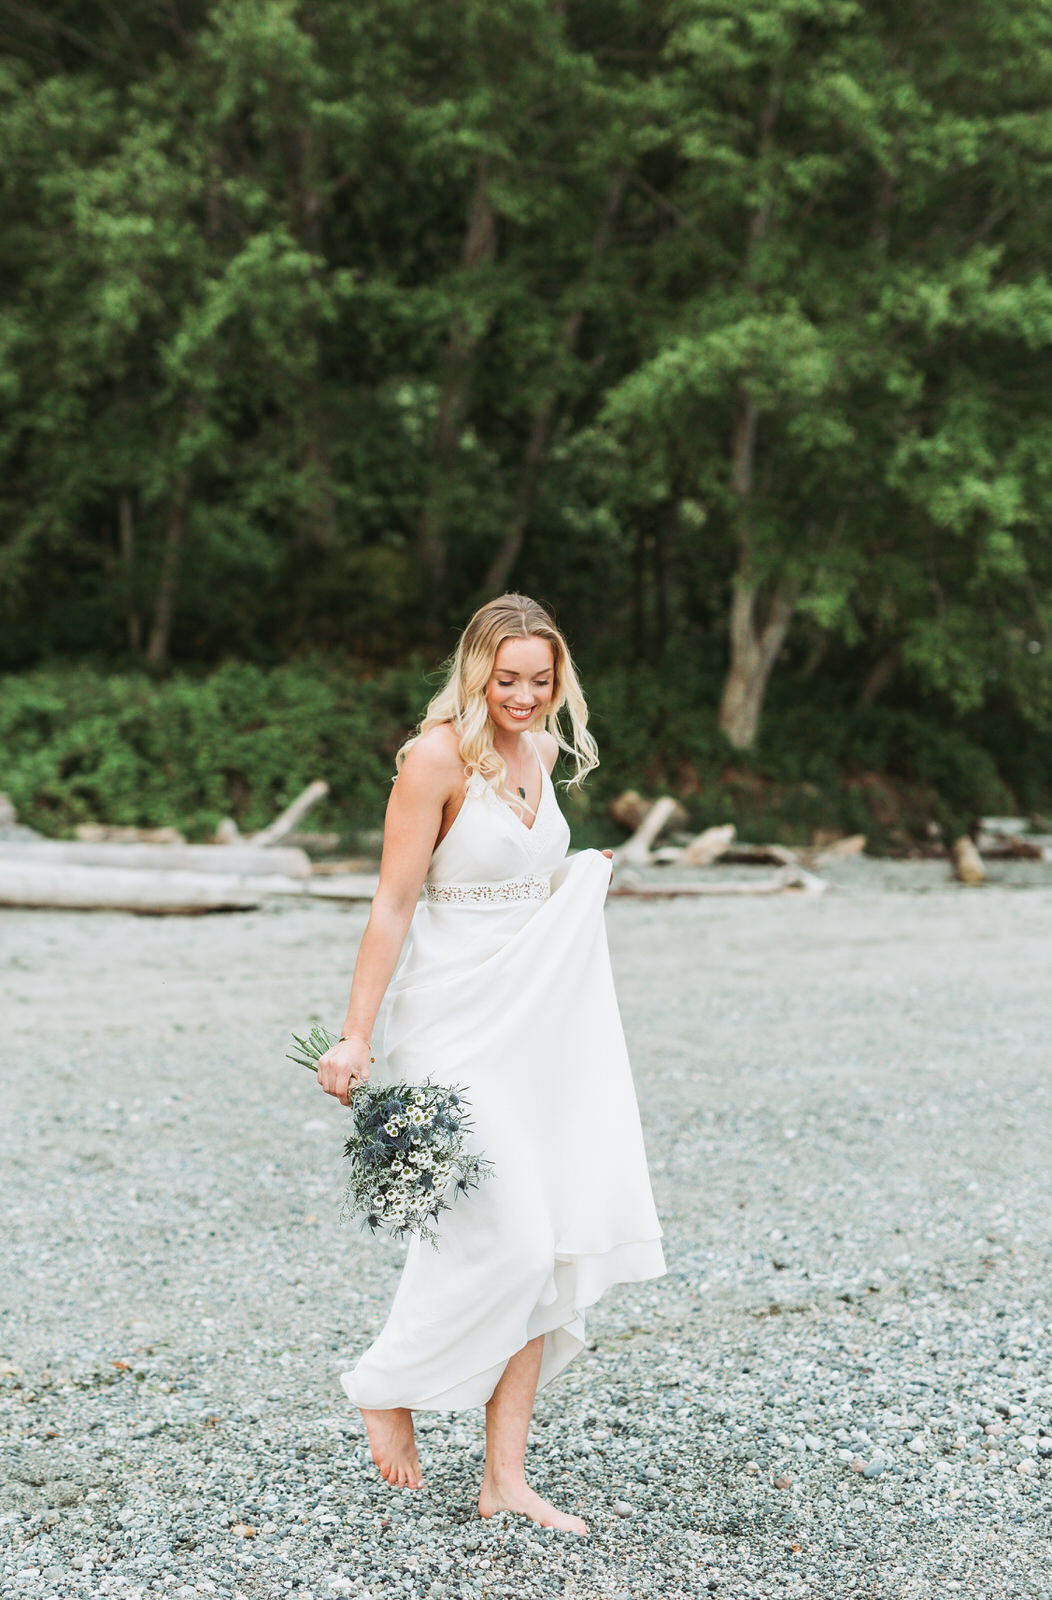 Jennifer Picard Photography - Vancouver Wedding Photographer - Sunshine Coast Wedding Photographer - Bridal InspirationIMG_8857_1_1.jpg